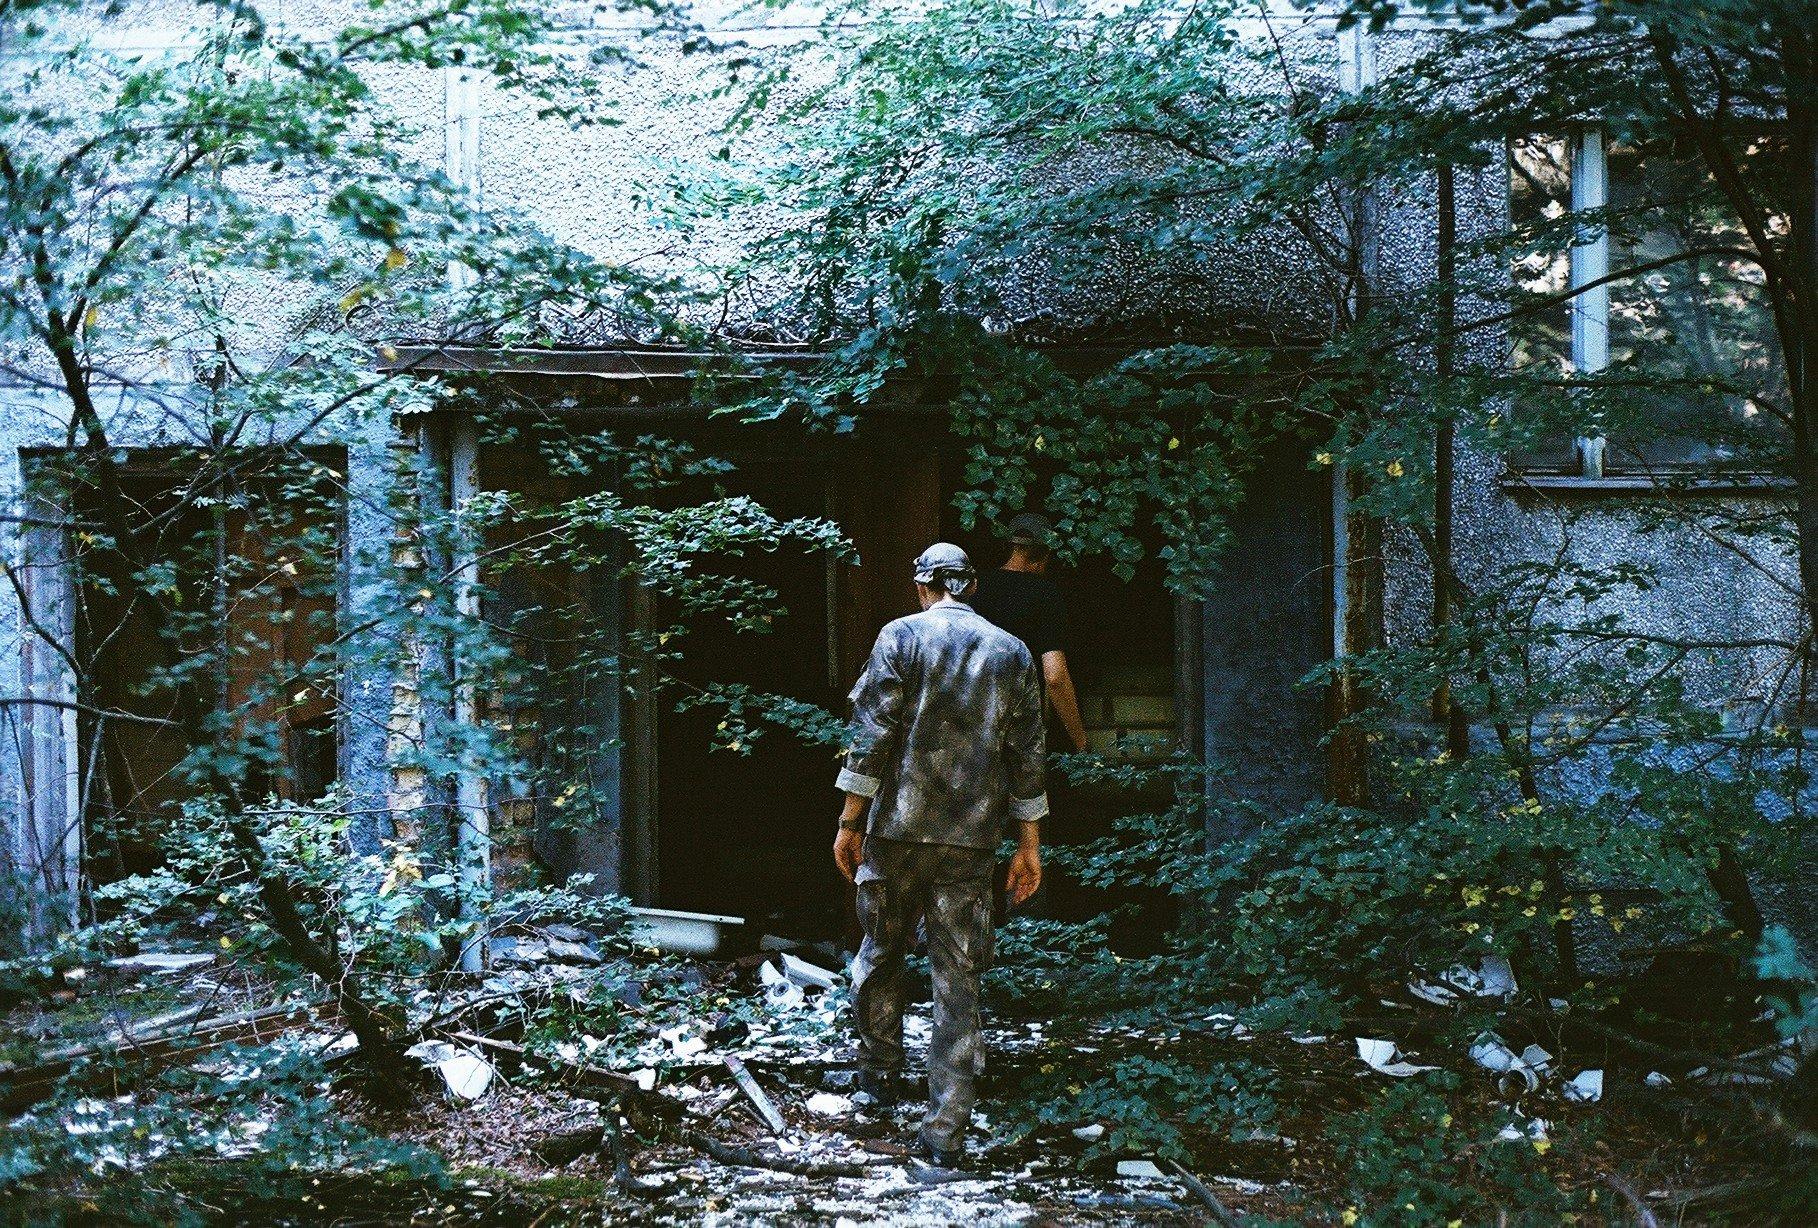 snaeking-into-chernobyl13 SNEAKING INTO CHERNOBYL